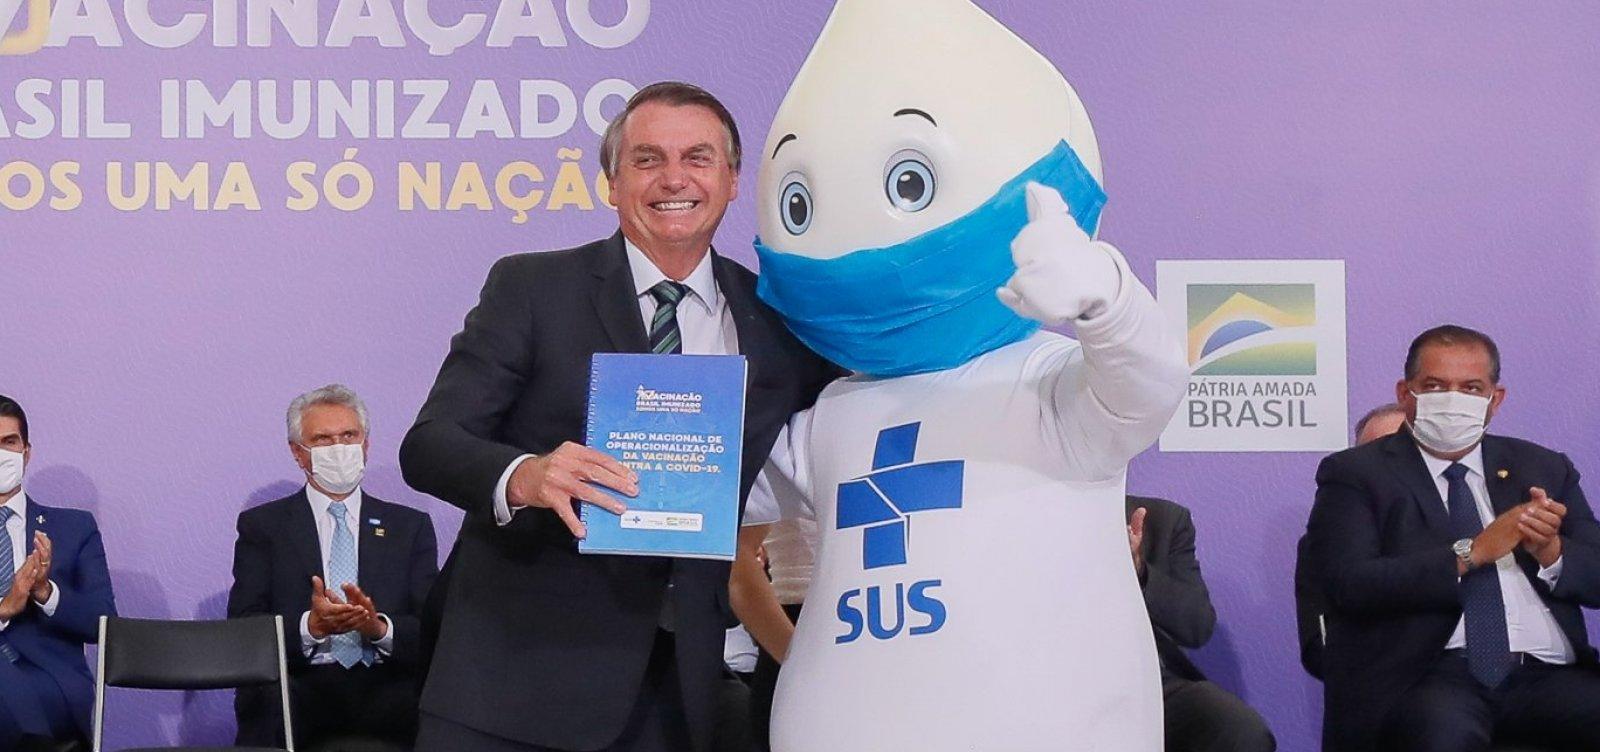 [Bolsonaro promete entrar na fila para se vacinar contra a Covid-19]